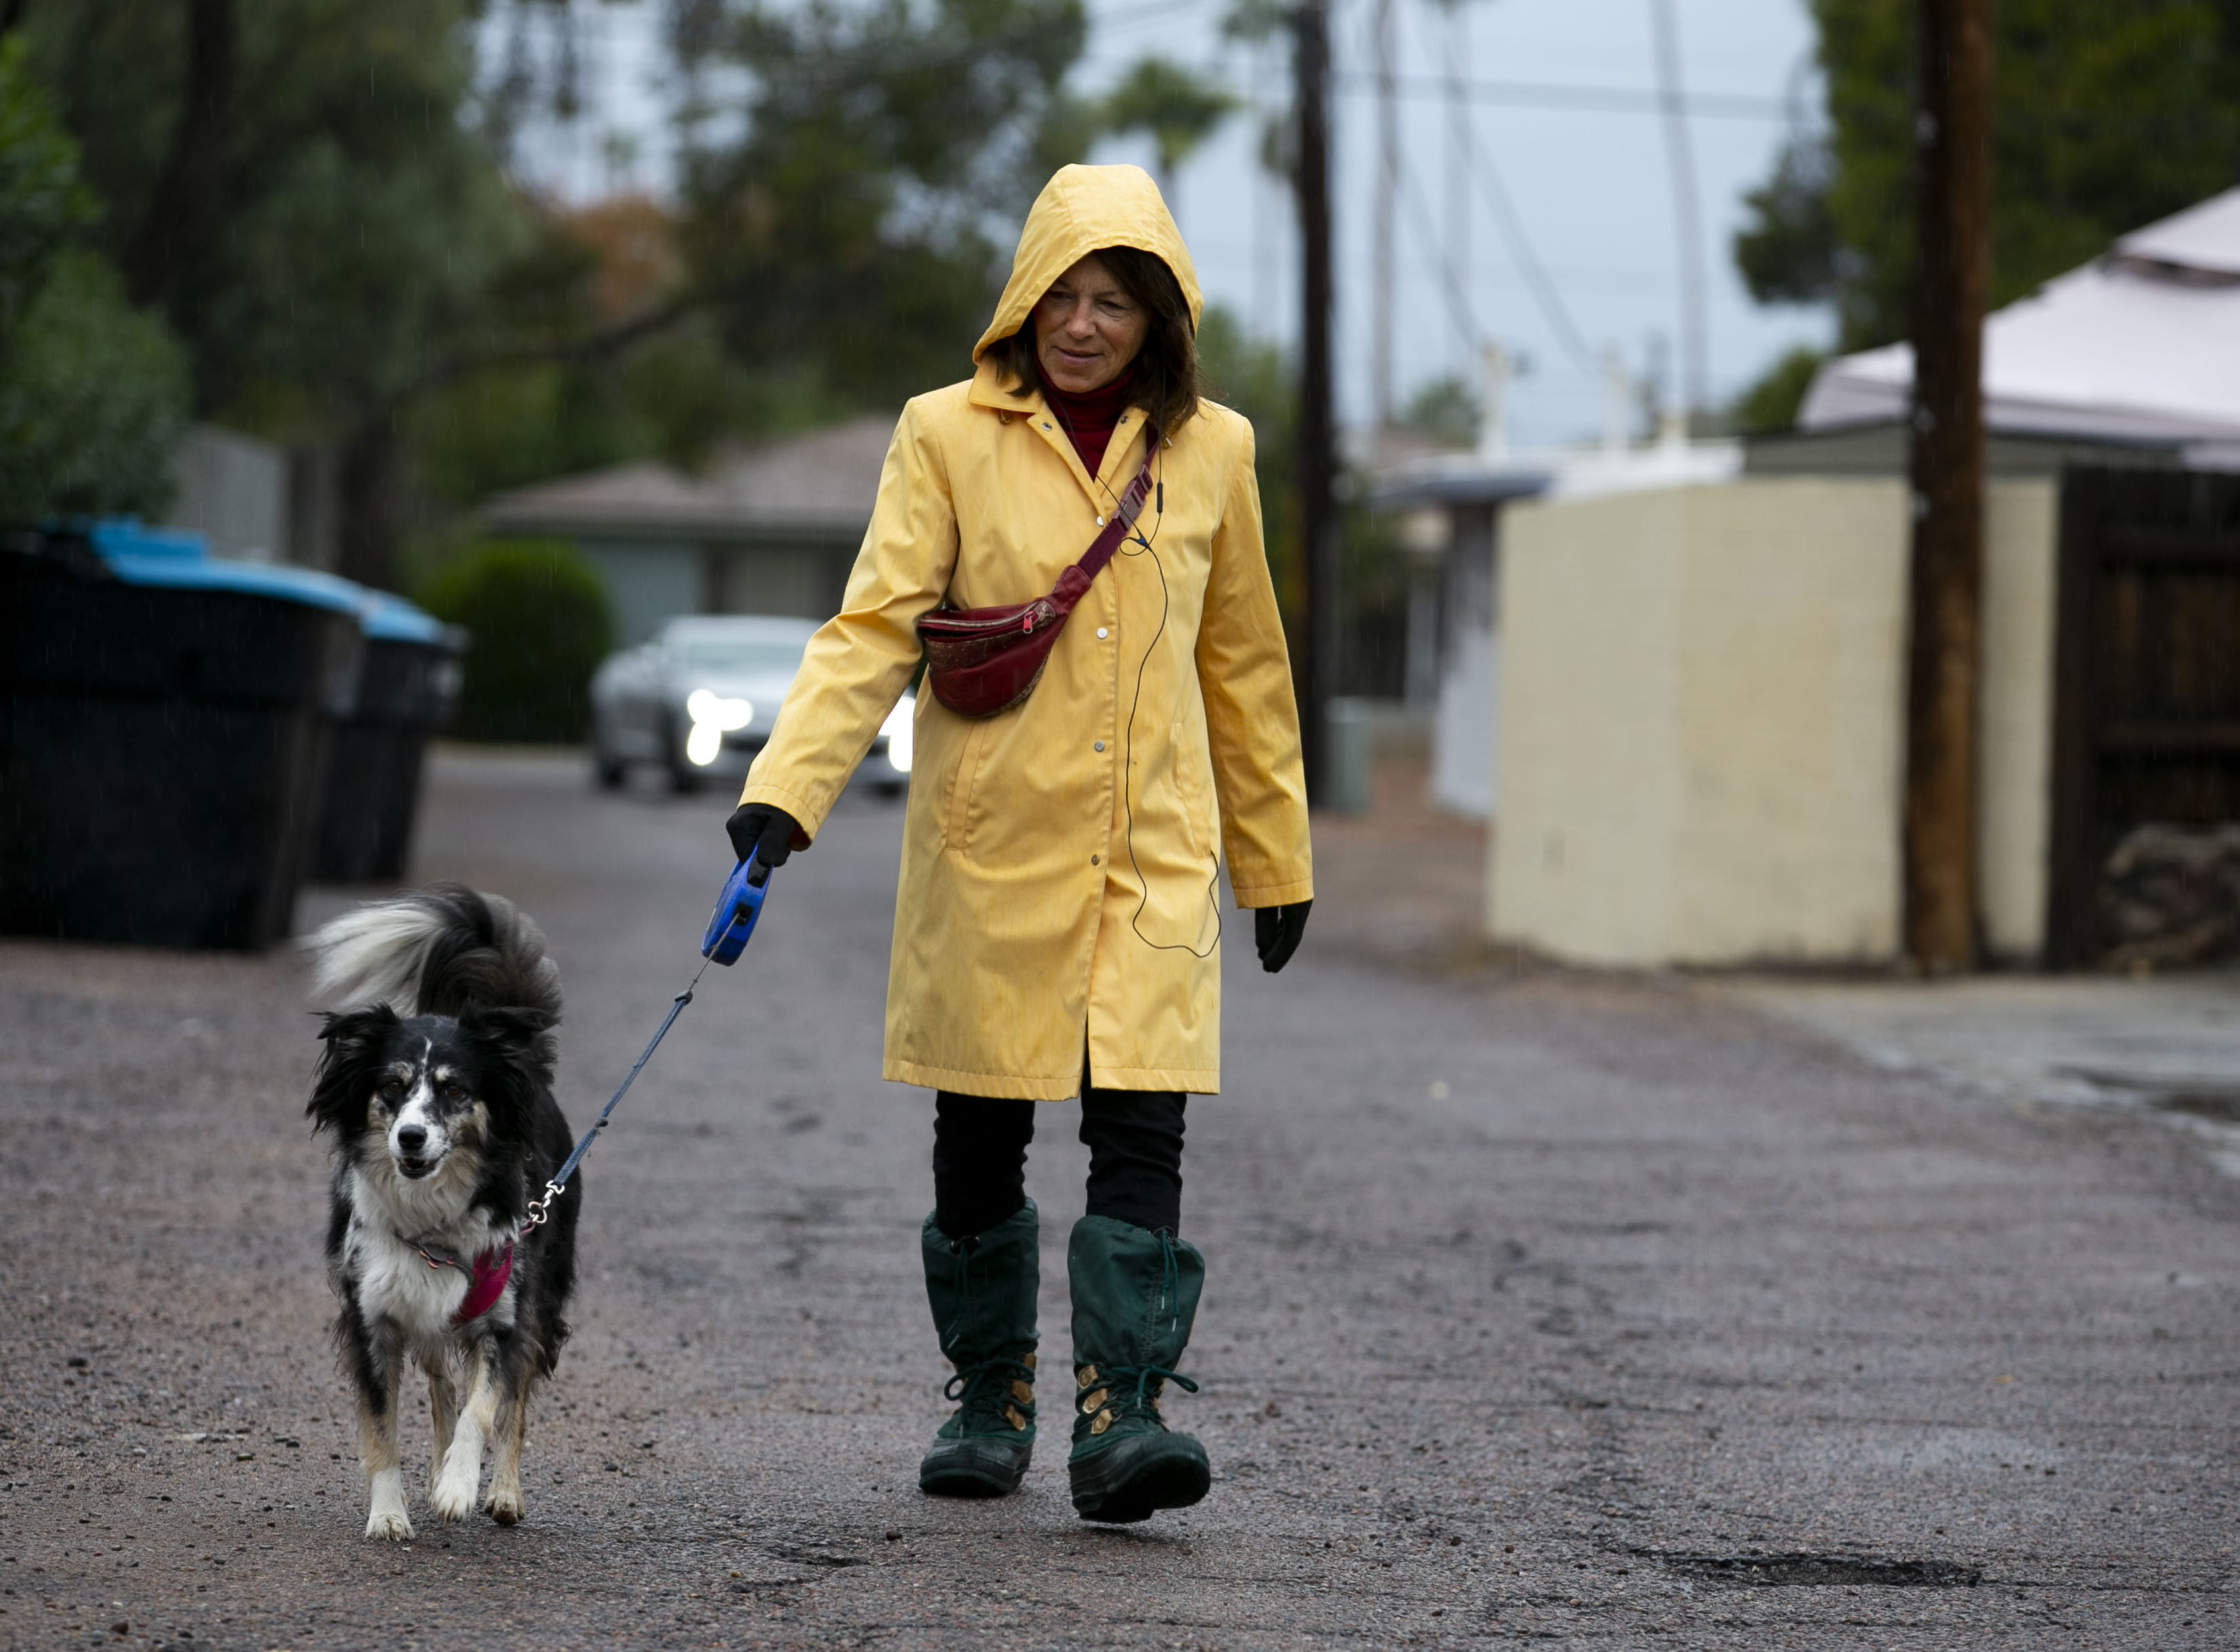 Pacific storm brings snow to Flagstaff, light rain in Phoenix area